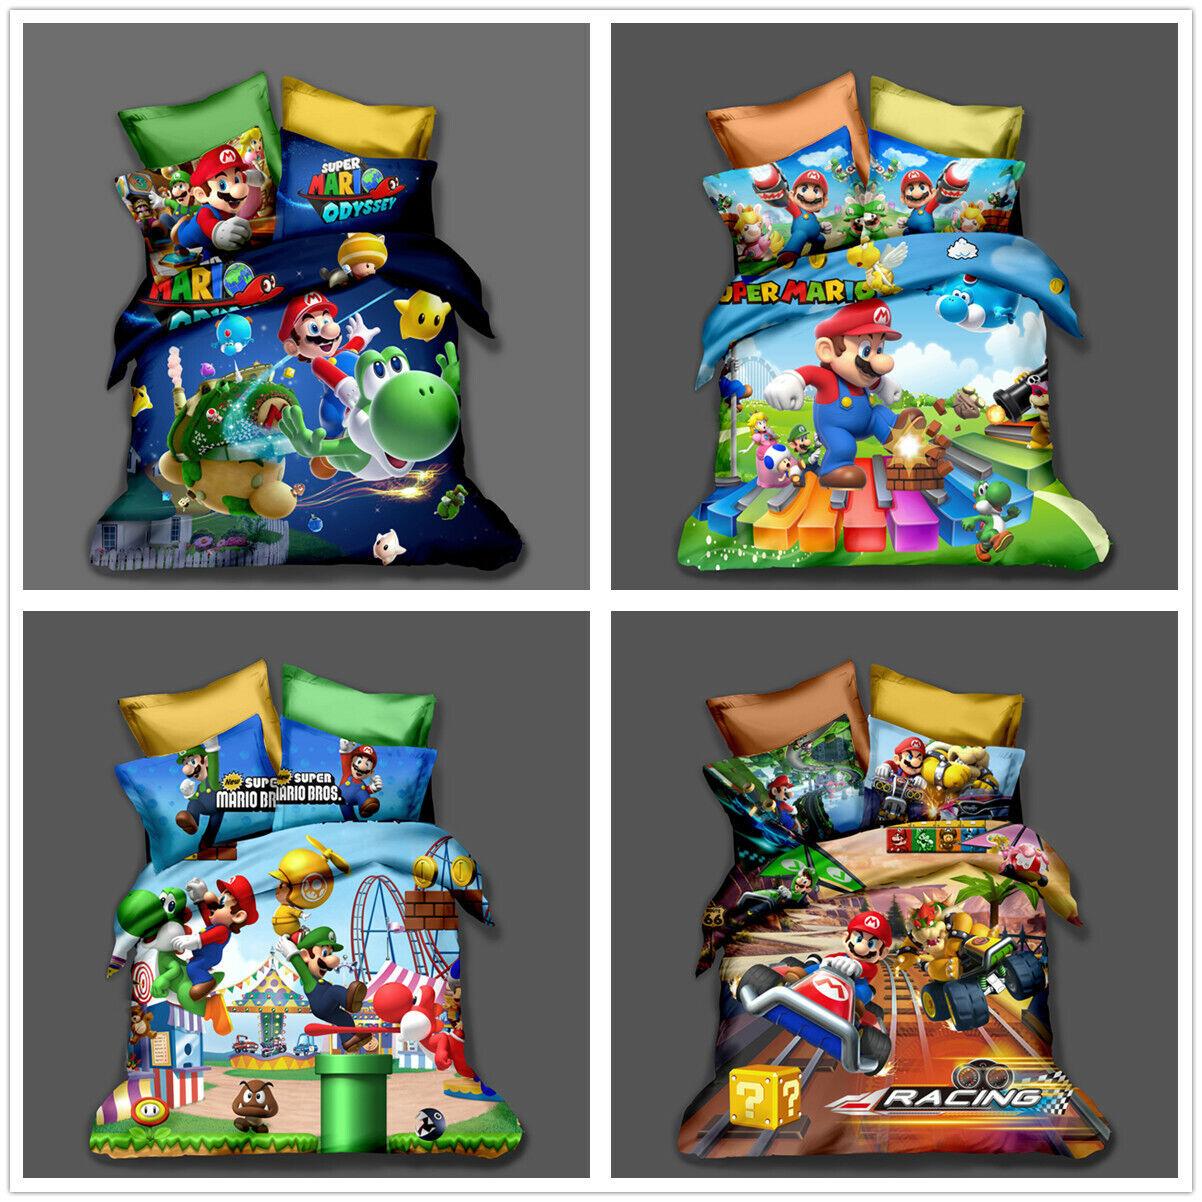 3D Super Mario Bros. Kids Duvet Cover Set Pillowcase Quilt Cover Comforter Cover